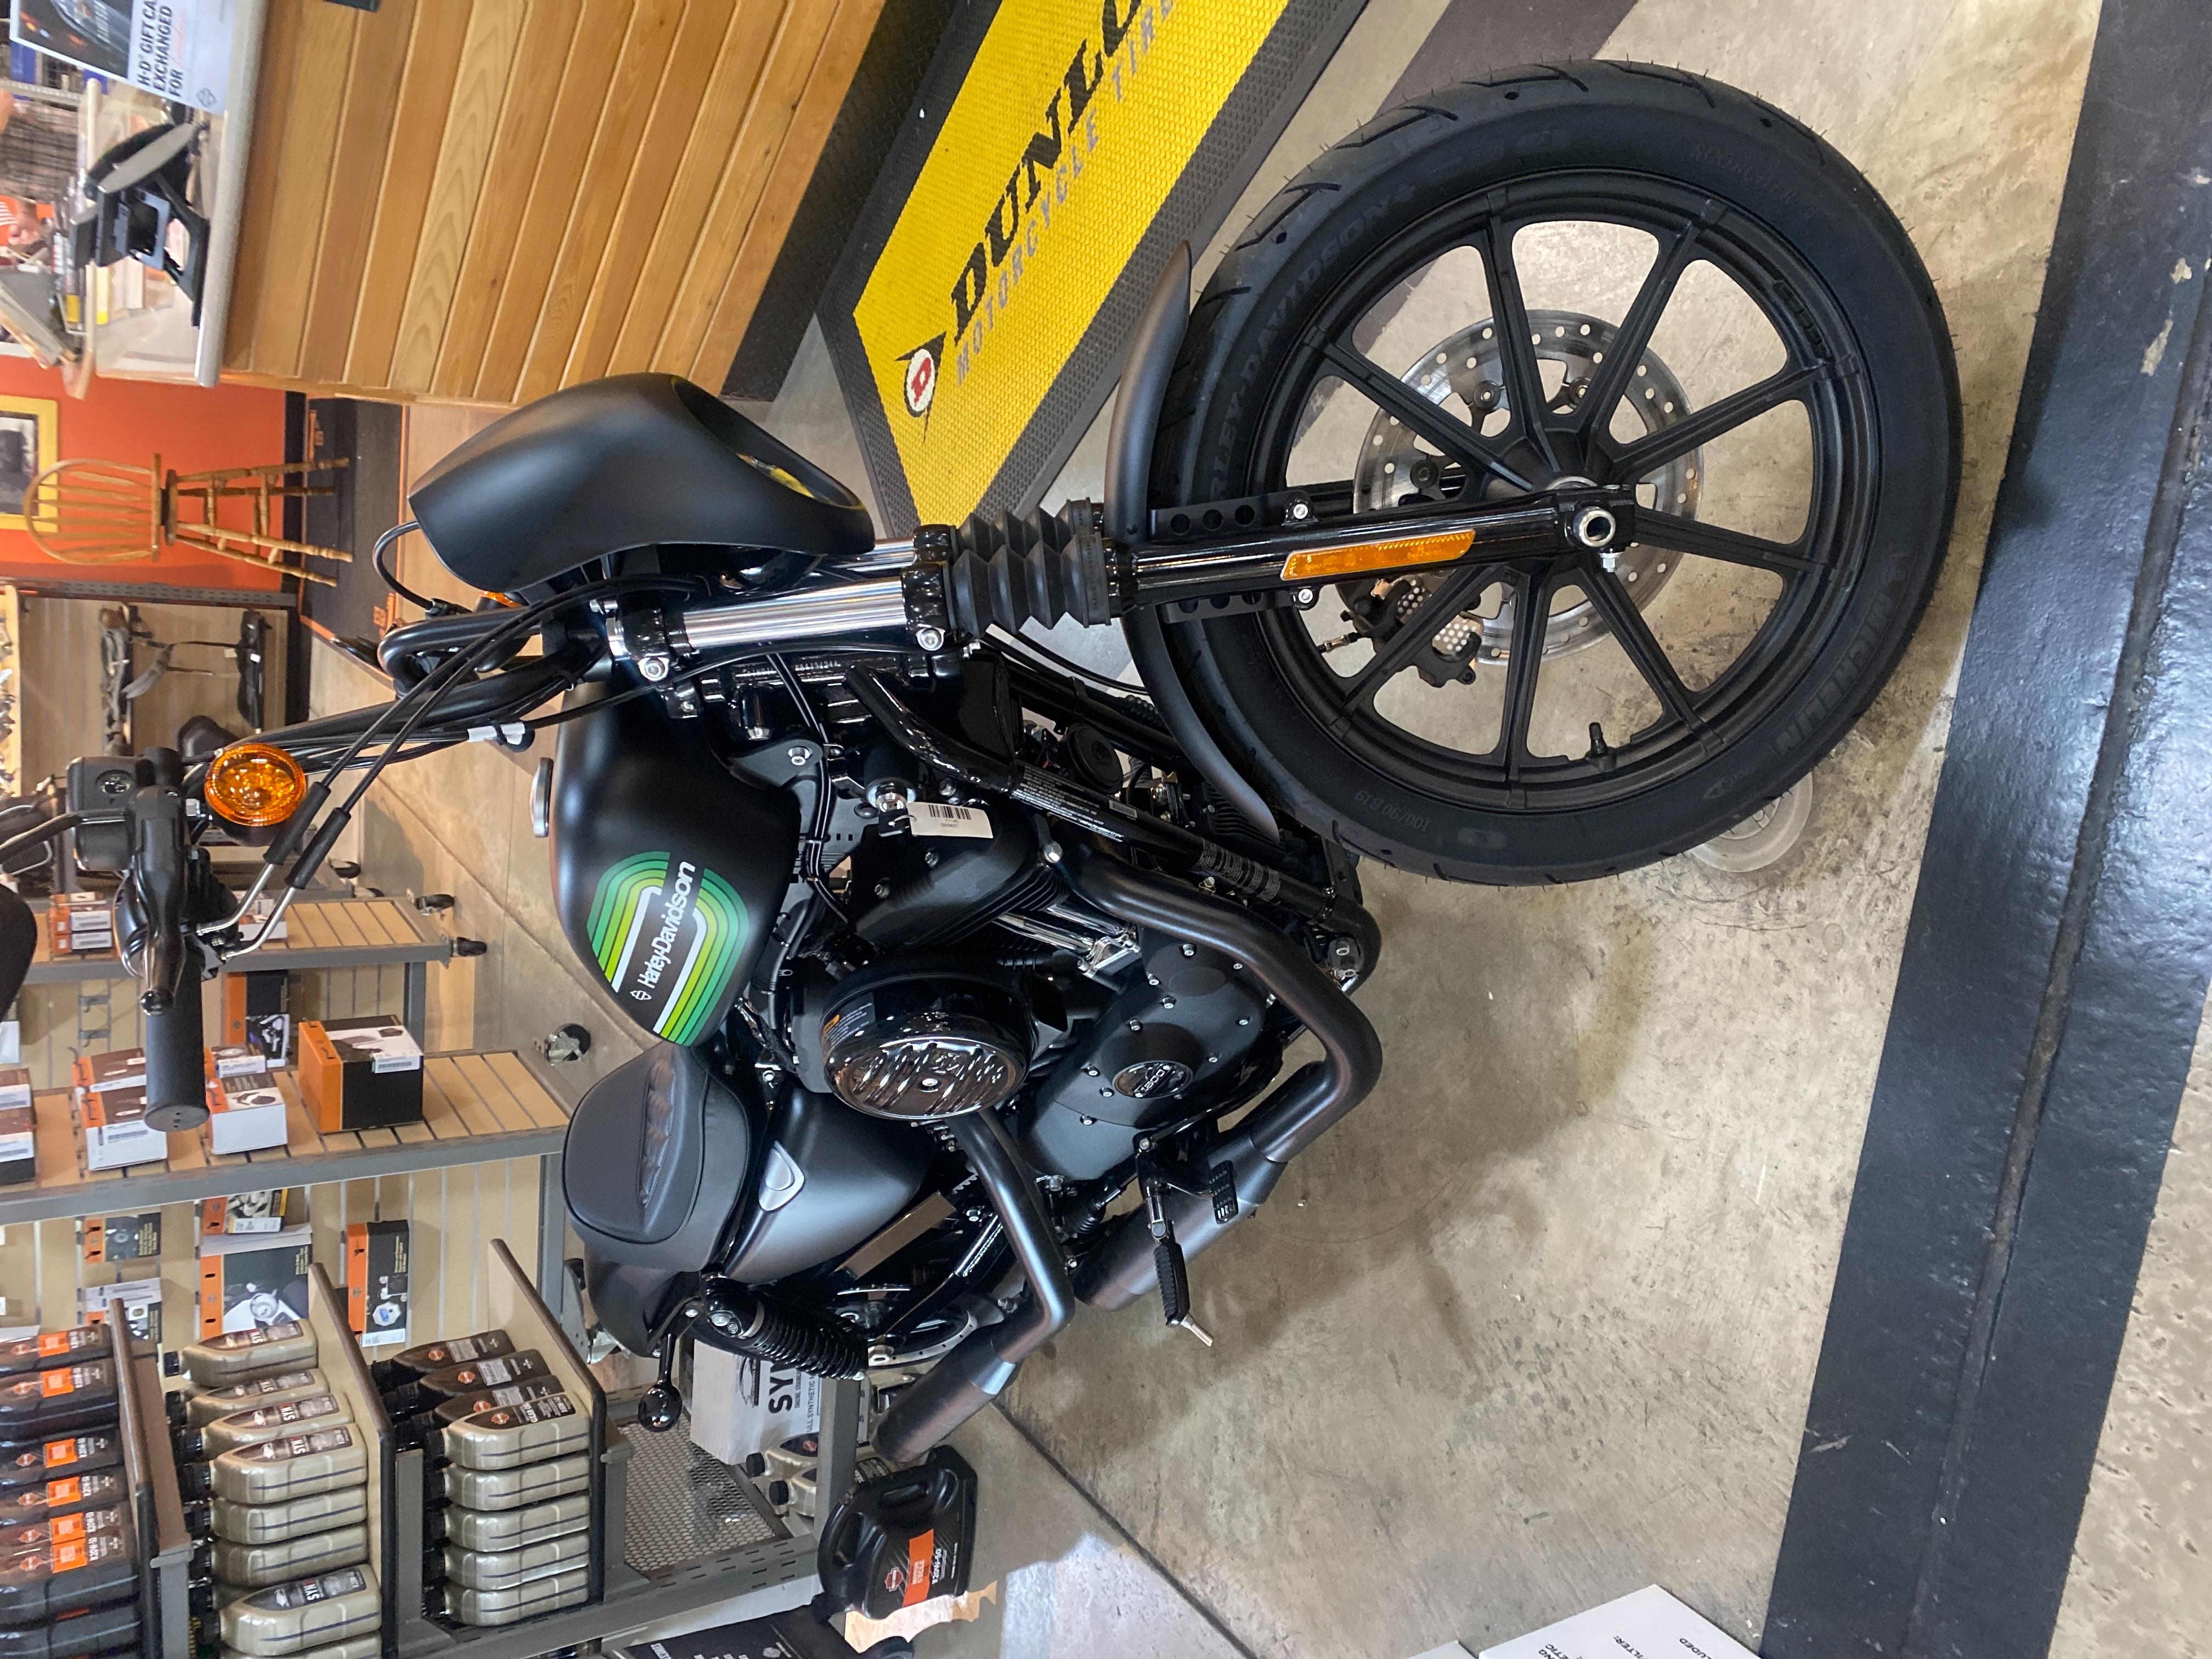 2021 Harley-Davidson Street XL 1200NS Iron 1200 at Outpost Harley-Davidson